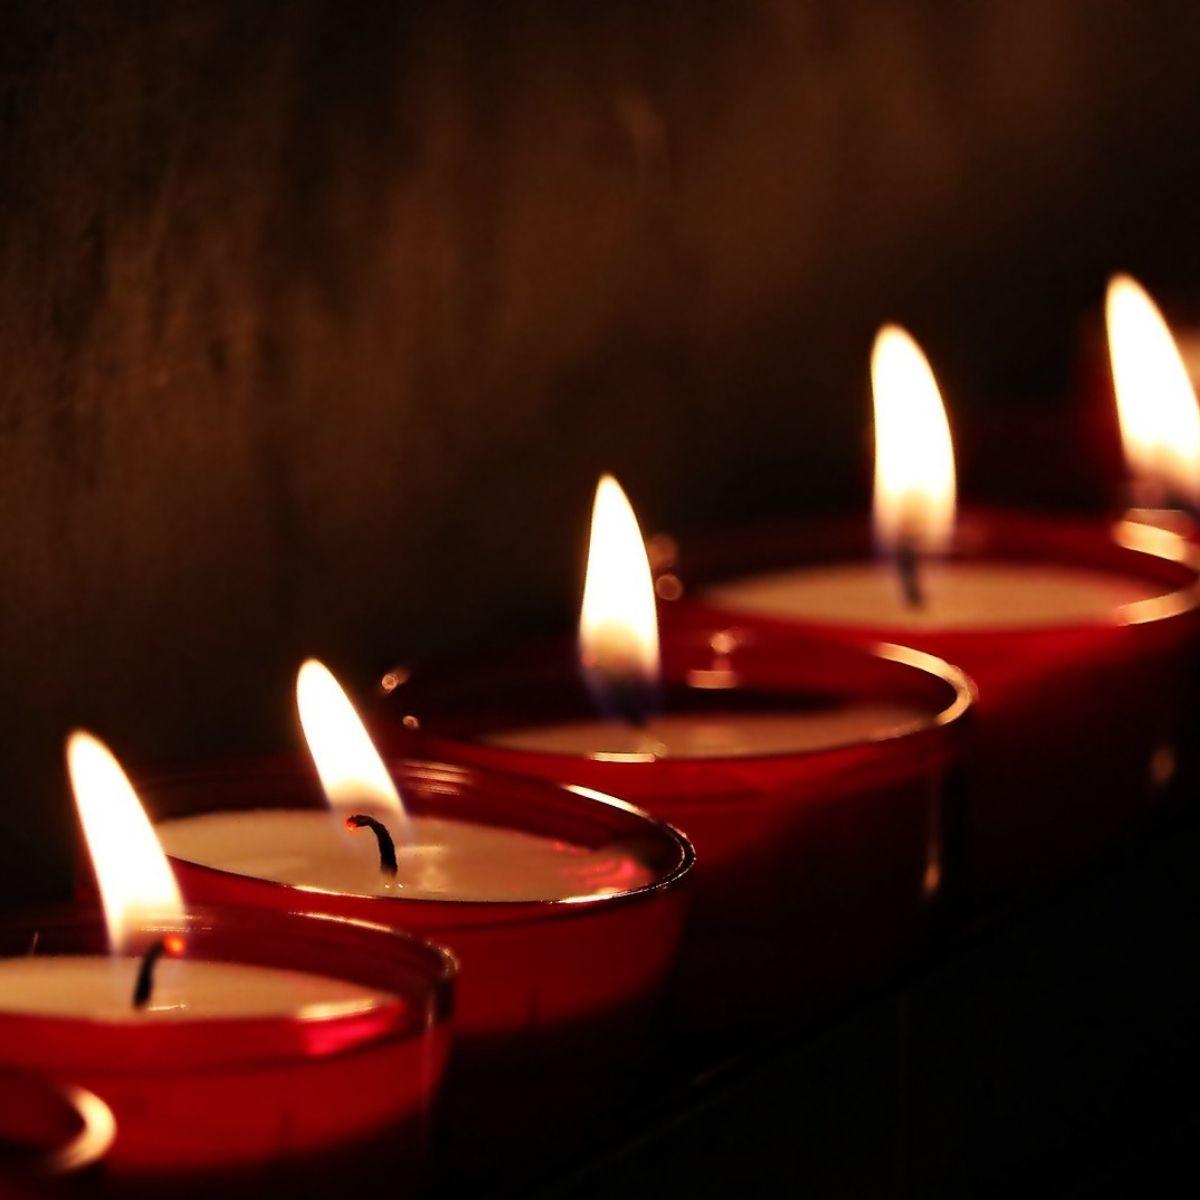 Symbolbild, viele Kerzen